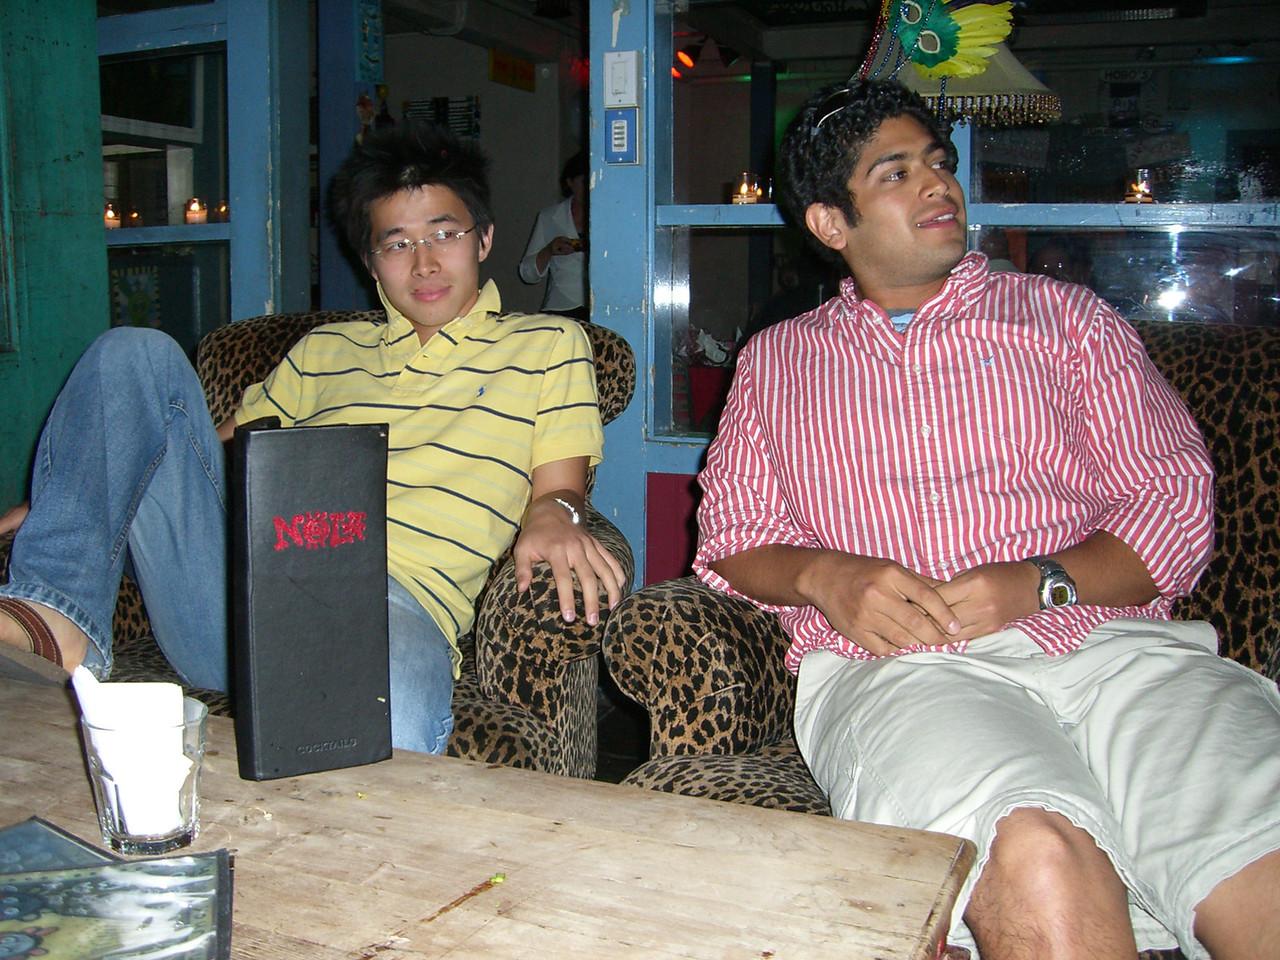 2006 05 24 Wed - Hyungsoo Kim & Pablo Pozo chillin' with Poon & I @ Nola's in Palo Alto